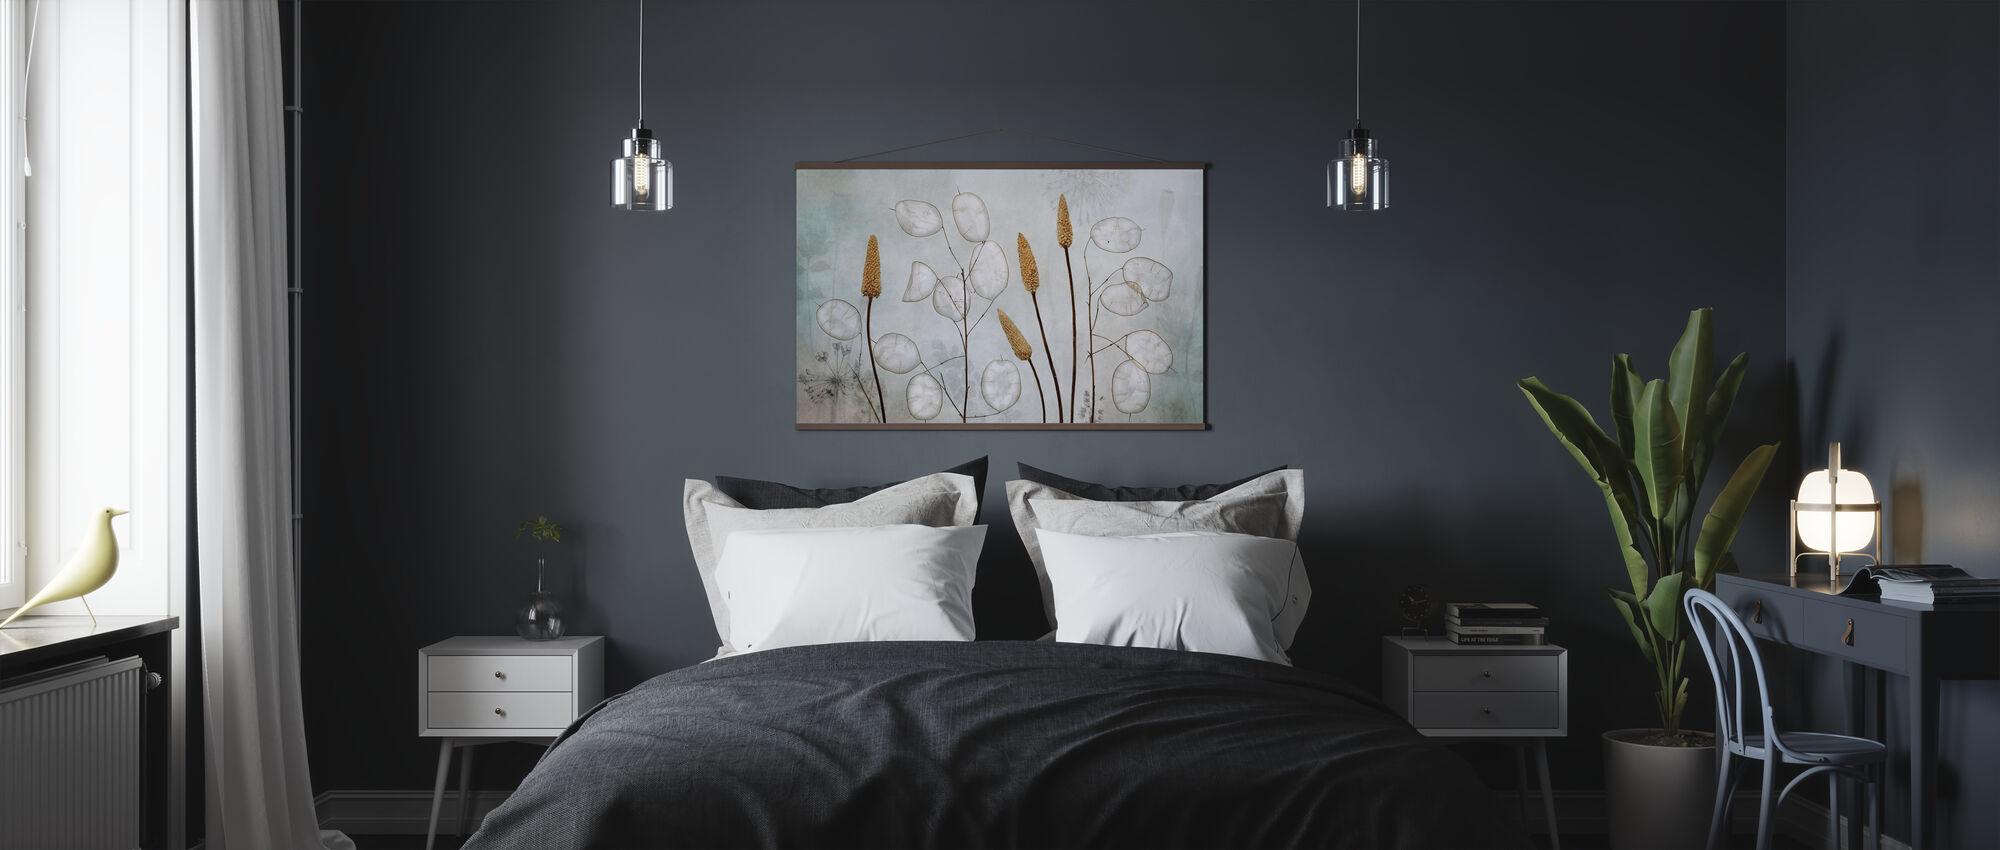 Lunaria - Poster - Bedroom